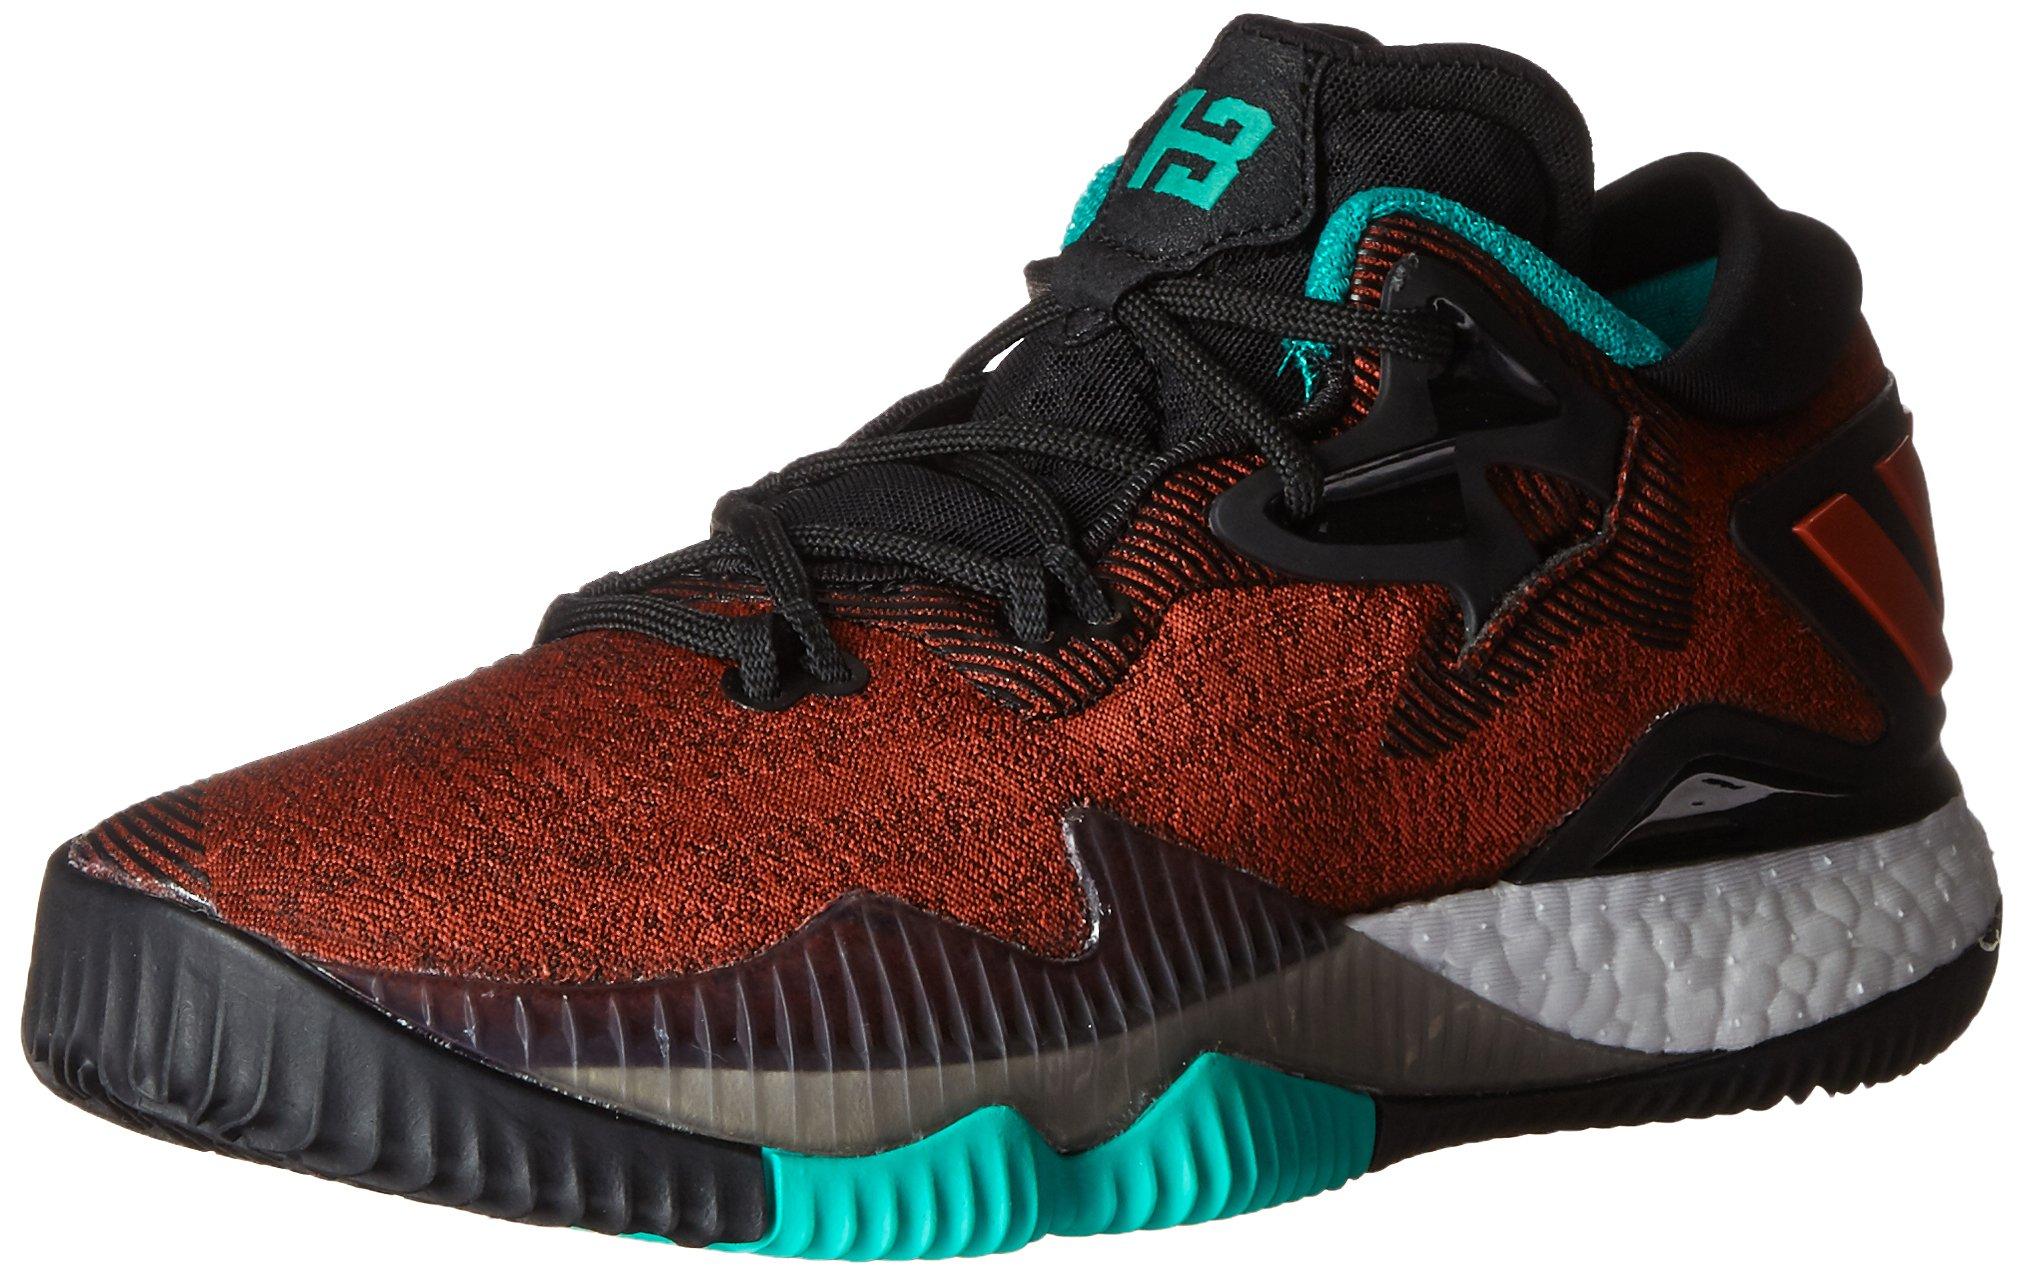 adidas Performance Boys' Crazylight Boost Low 2016 J Skate Shoe, Ray Red Scarlet/Black, 7 M US Big Kid